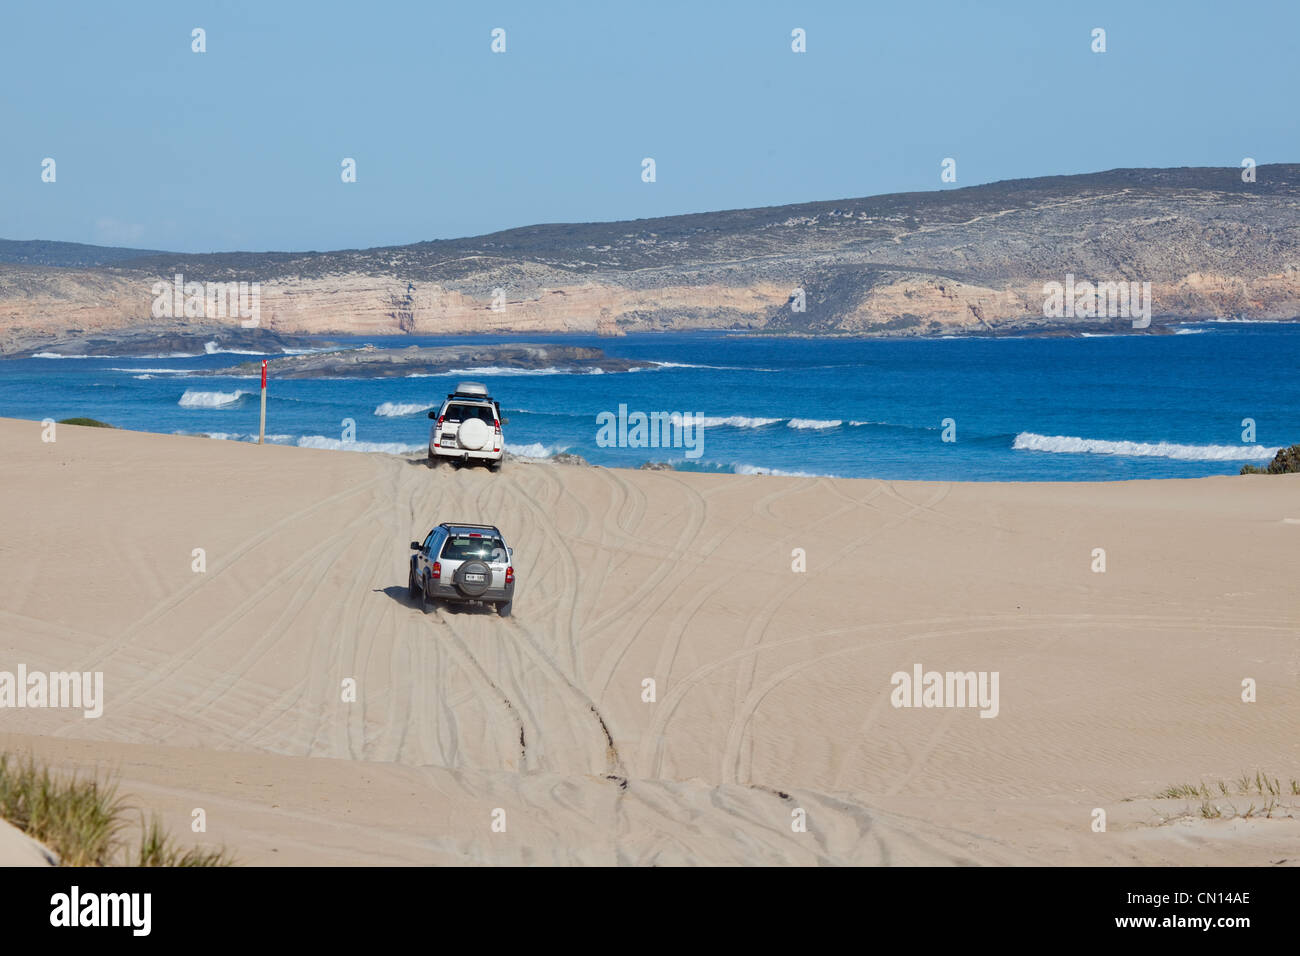 4 wheel drives on sand dunes. Eyre Peninsula. South Australia. - Stock Image